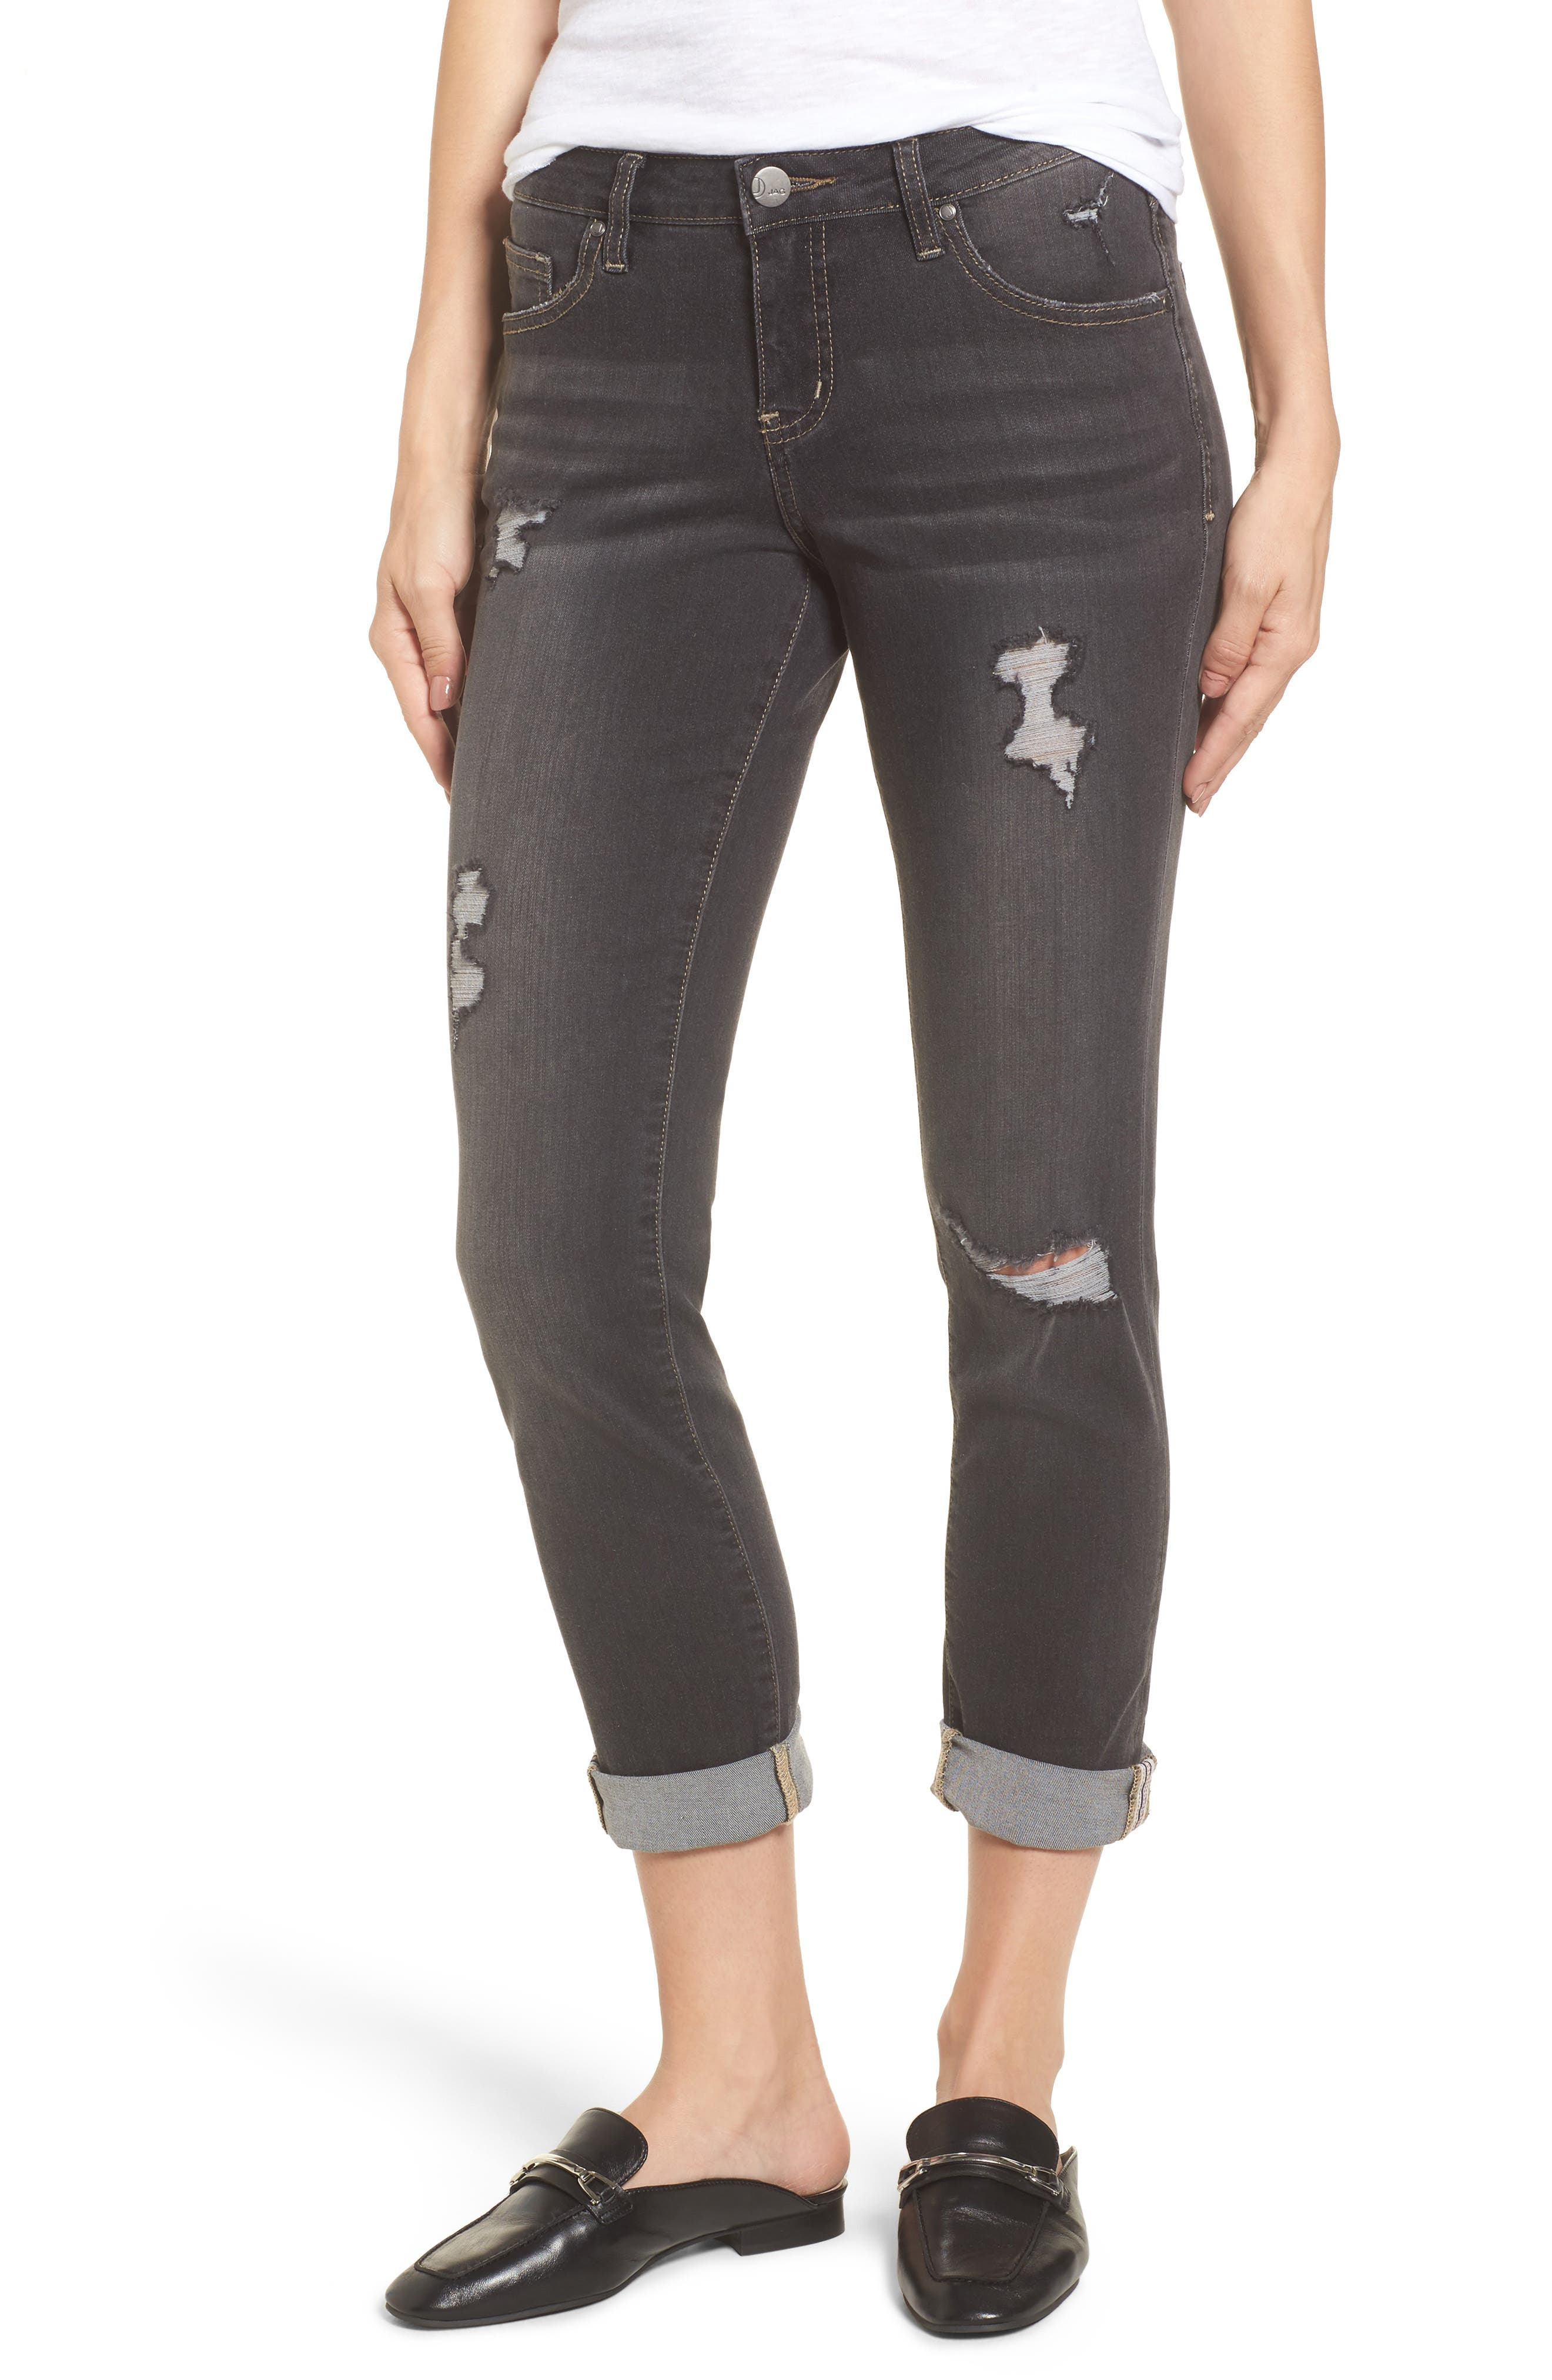 Carter Cuffed Girlfriend Jeans,                         Main,                         color, Dark Grey